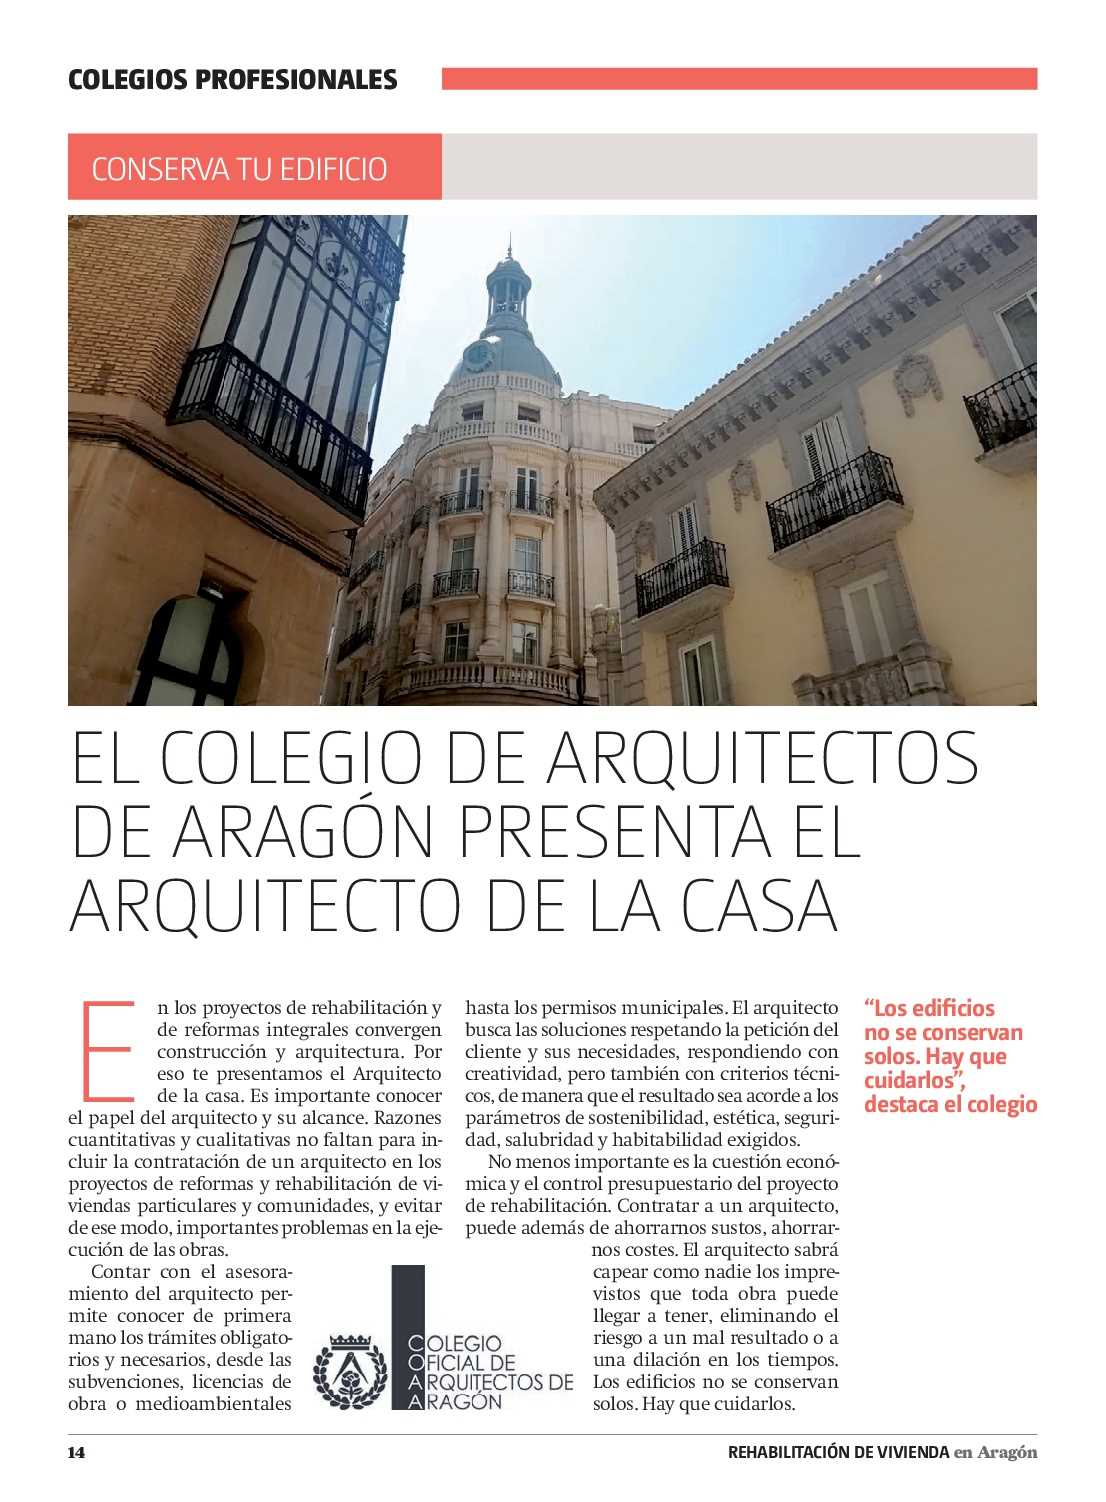 14-15-arquitectos_Arquitectodelacasa-001.jpg